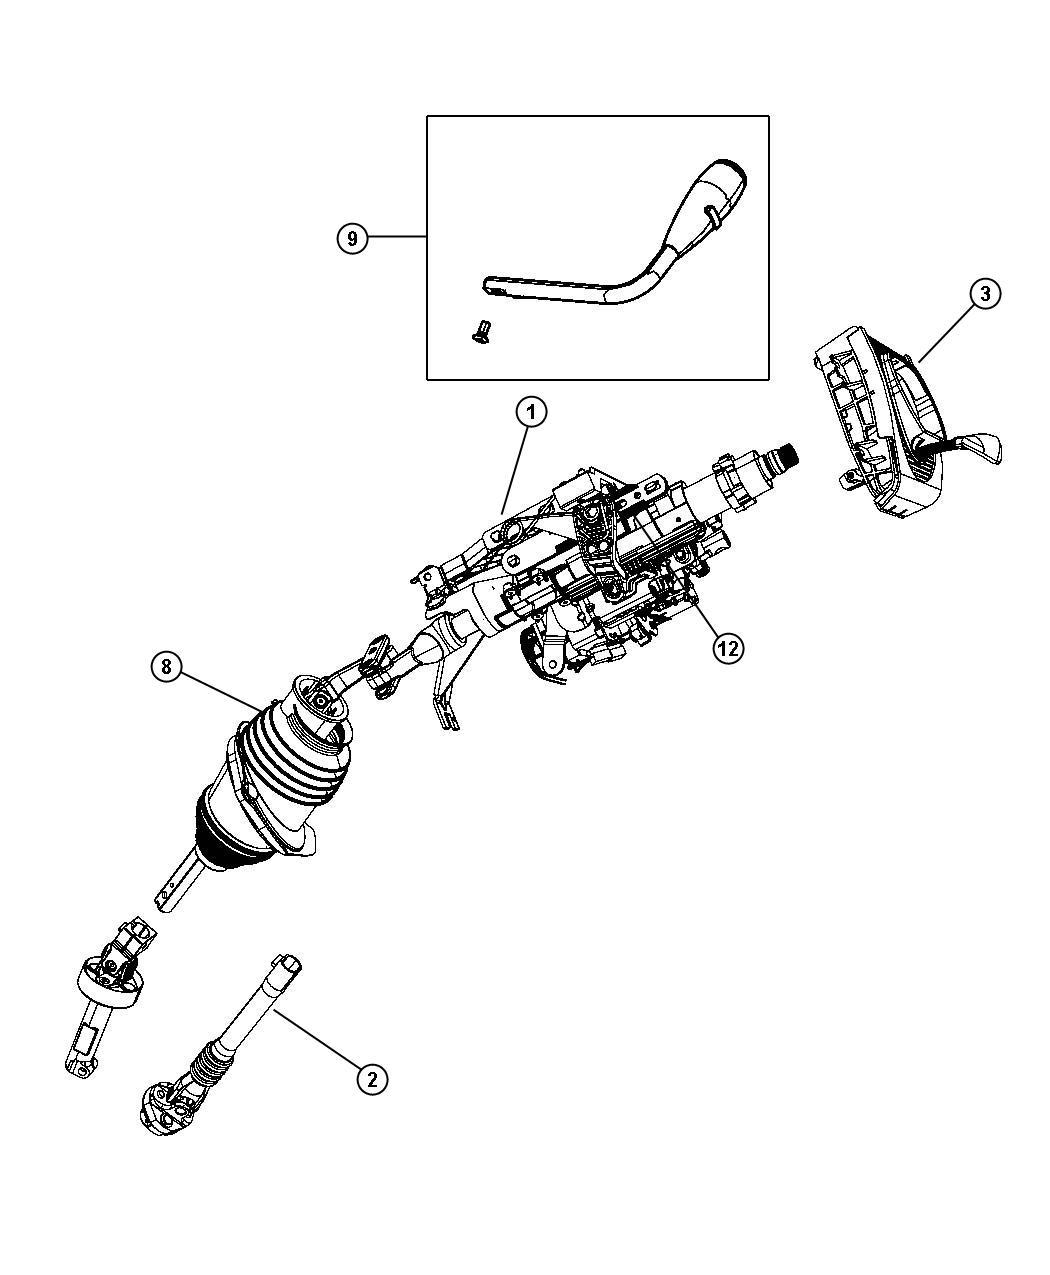 1998 cadillac alternator wiring harness